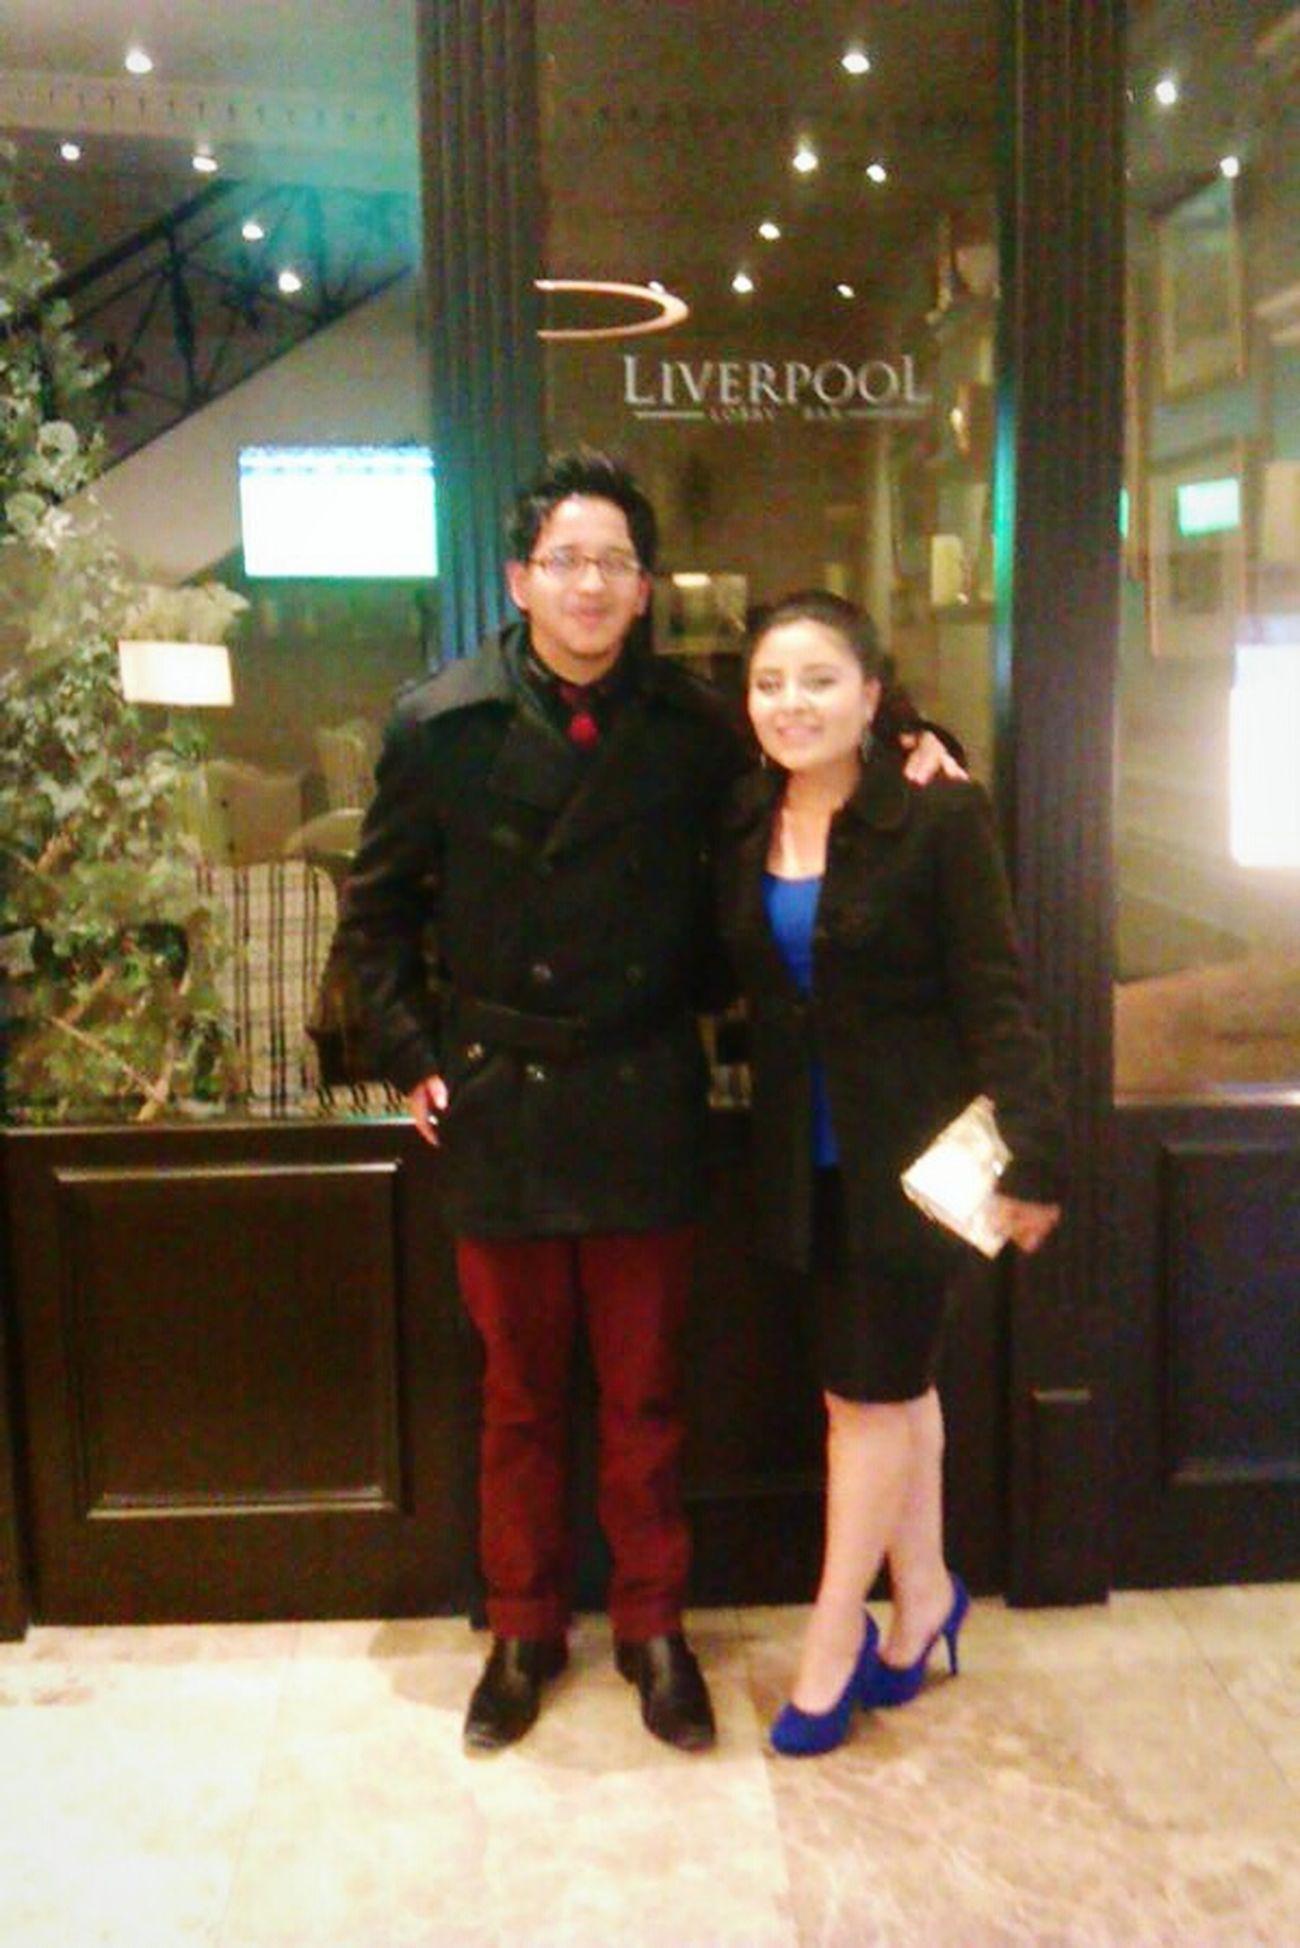 Love Liverpool YNWA Liverpool Football Club LiverpoolRedsEcuador We Are Liverpool Tralalalala... TeAmoEsposa Mariajose